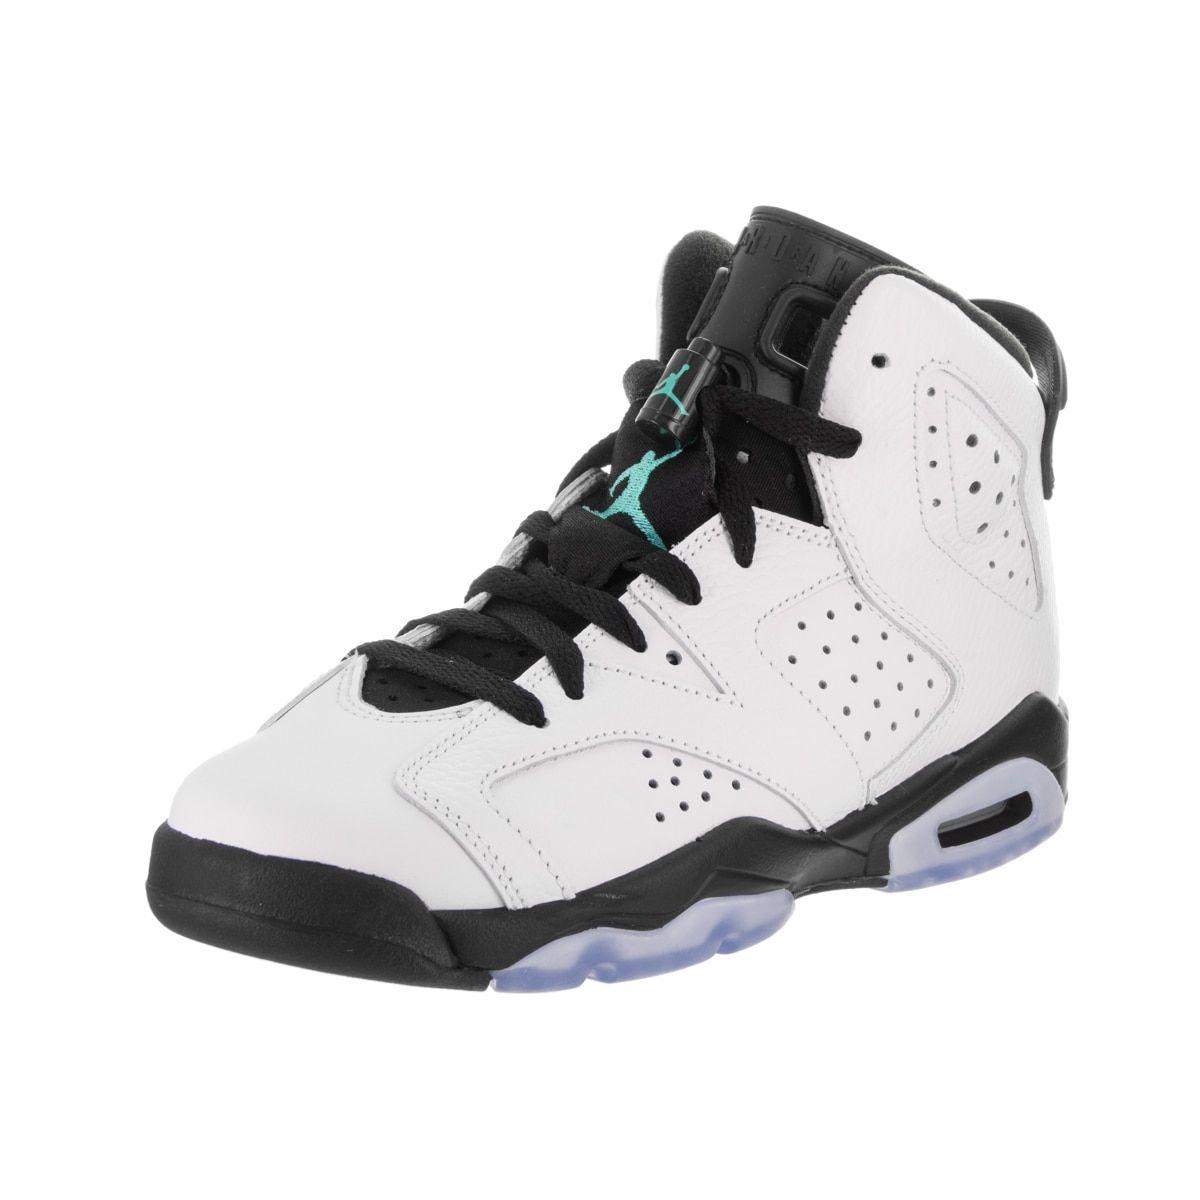 Nike Jordan Kids Air Jordan 6 Retro BG Basketball Shoe